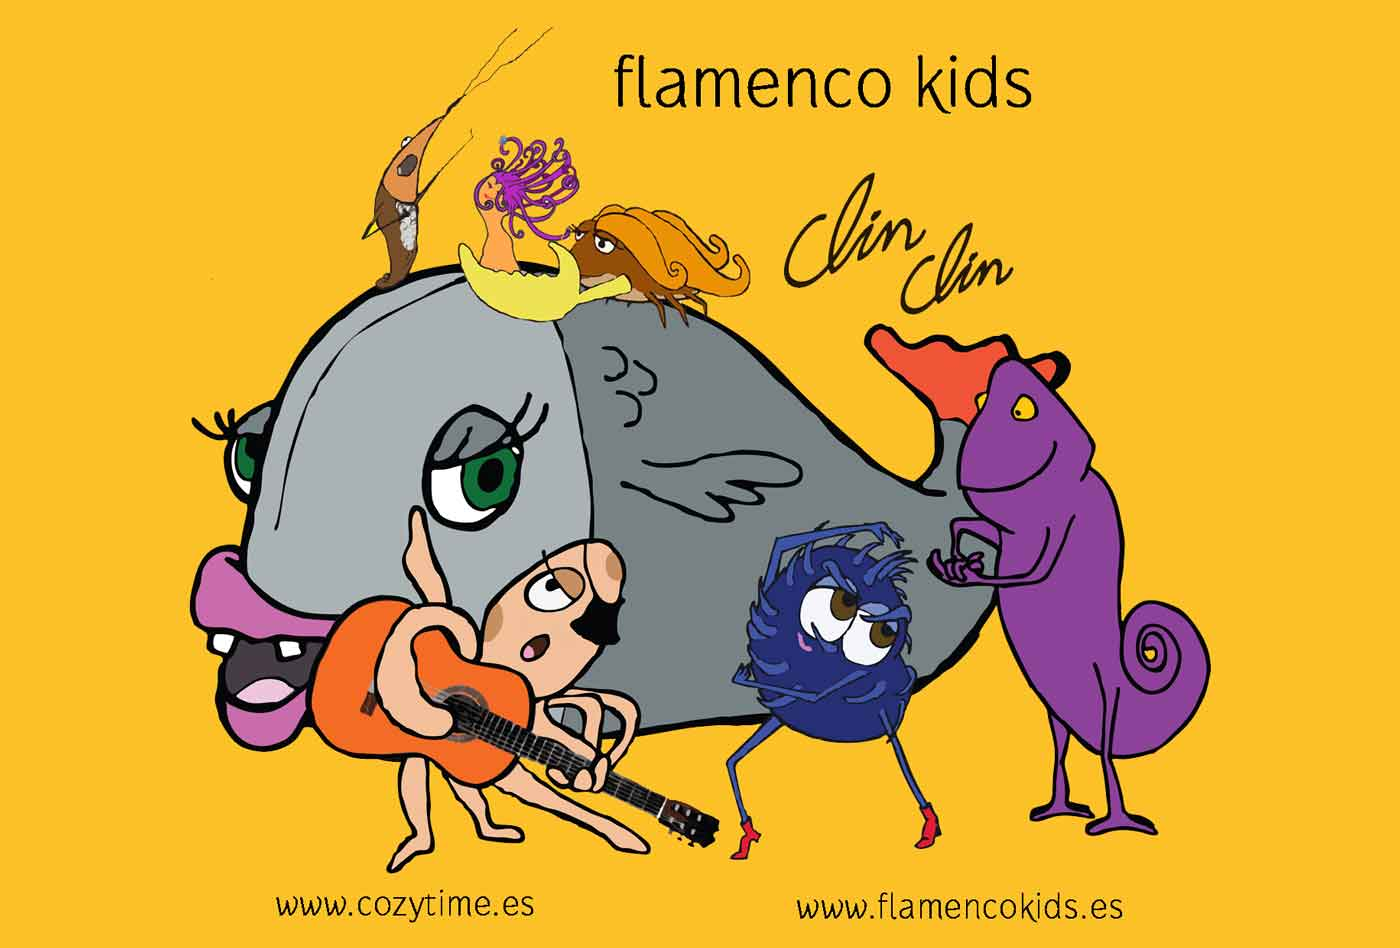 FLAMENCO KIDS EN QUILLOLANDIA